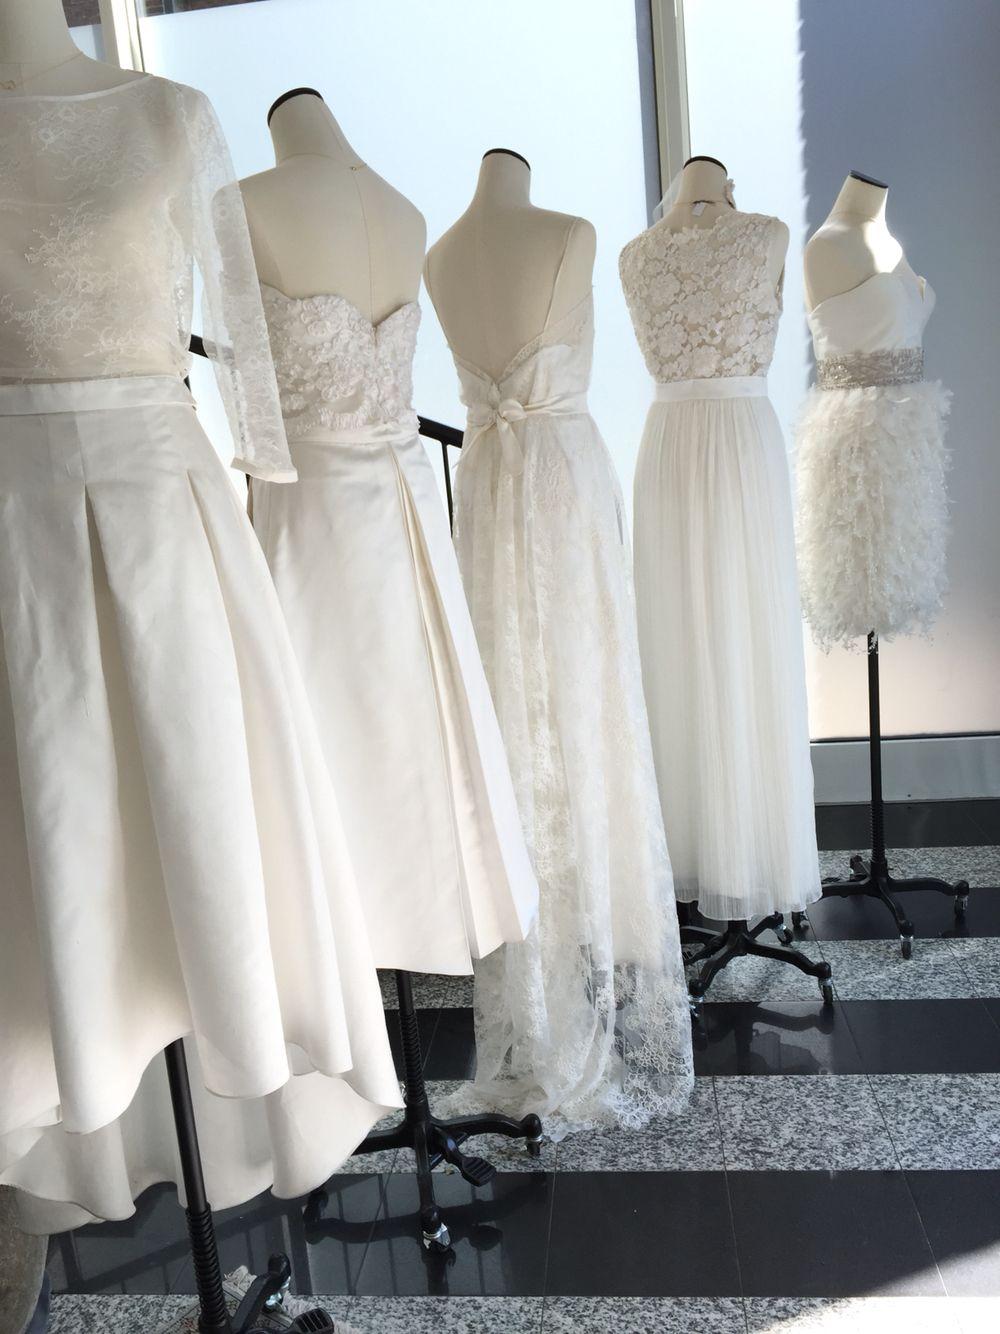 Wedding Isi Lieb Bridal Collection Showroom & Atelier Düsseldorf